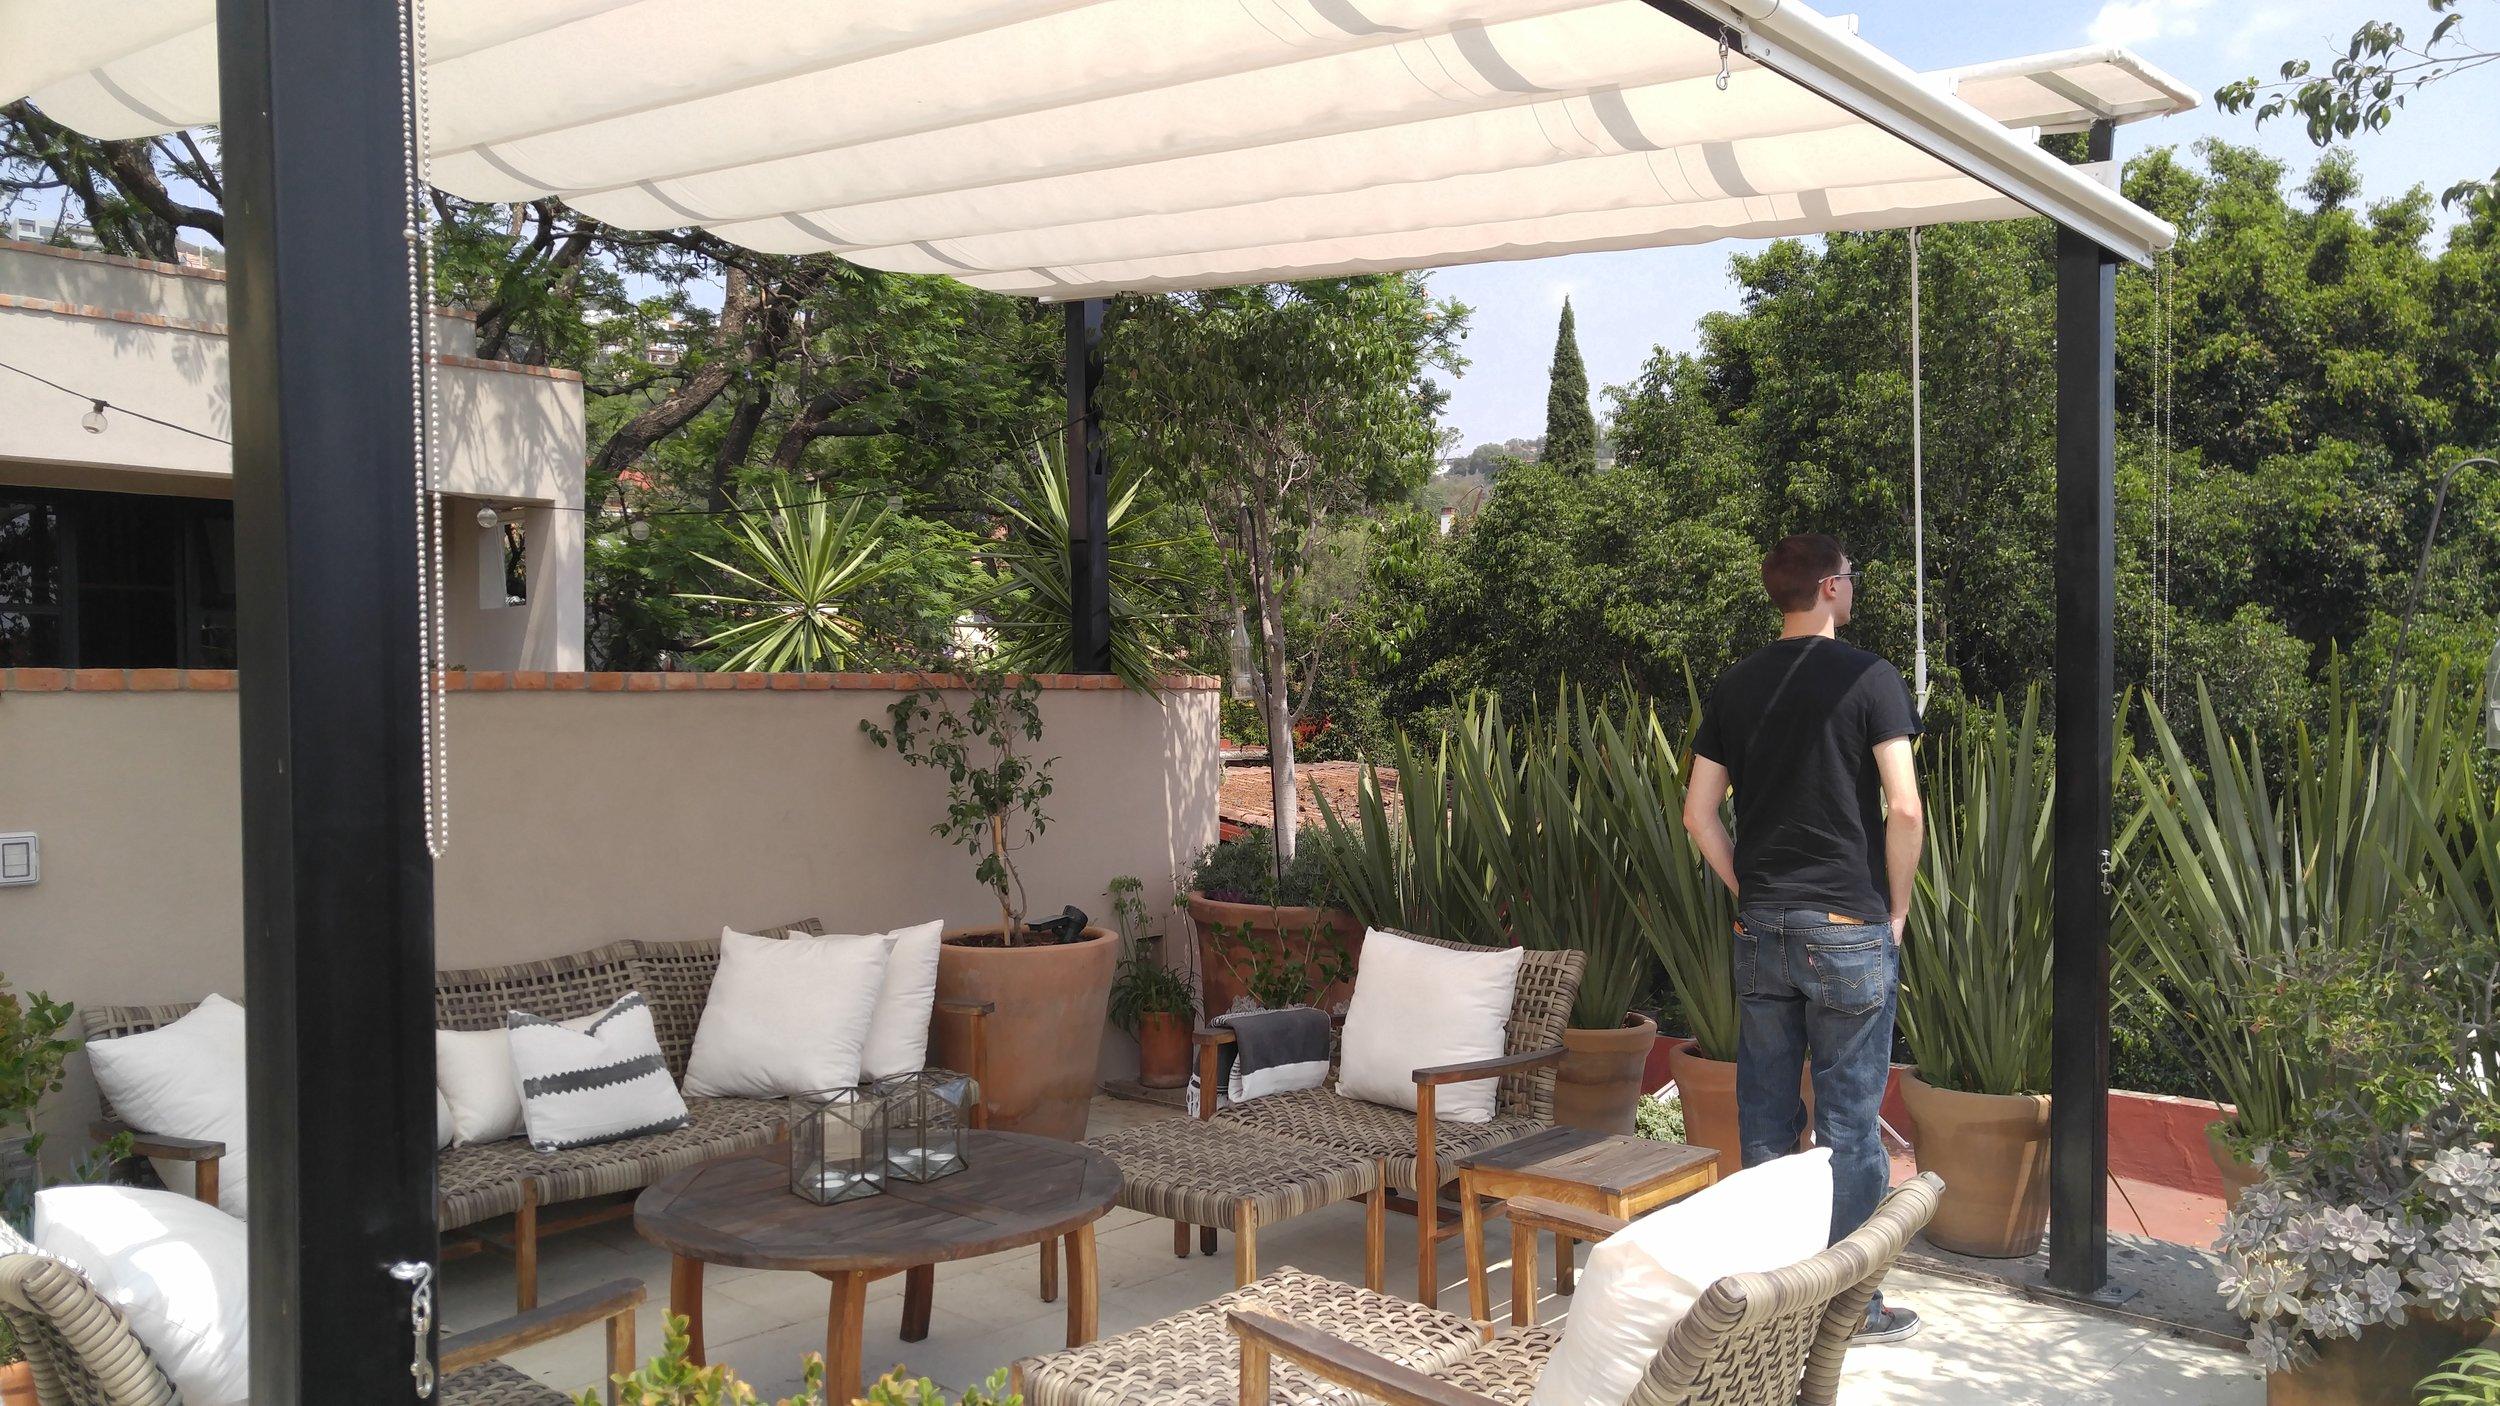 Our rooftop escape at  Casa Zenaida (feat. Tyler's back).